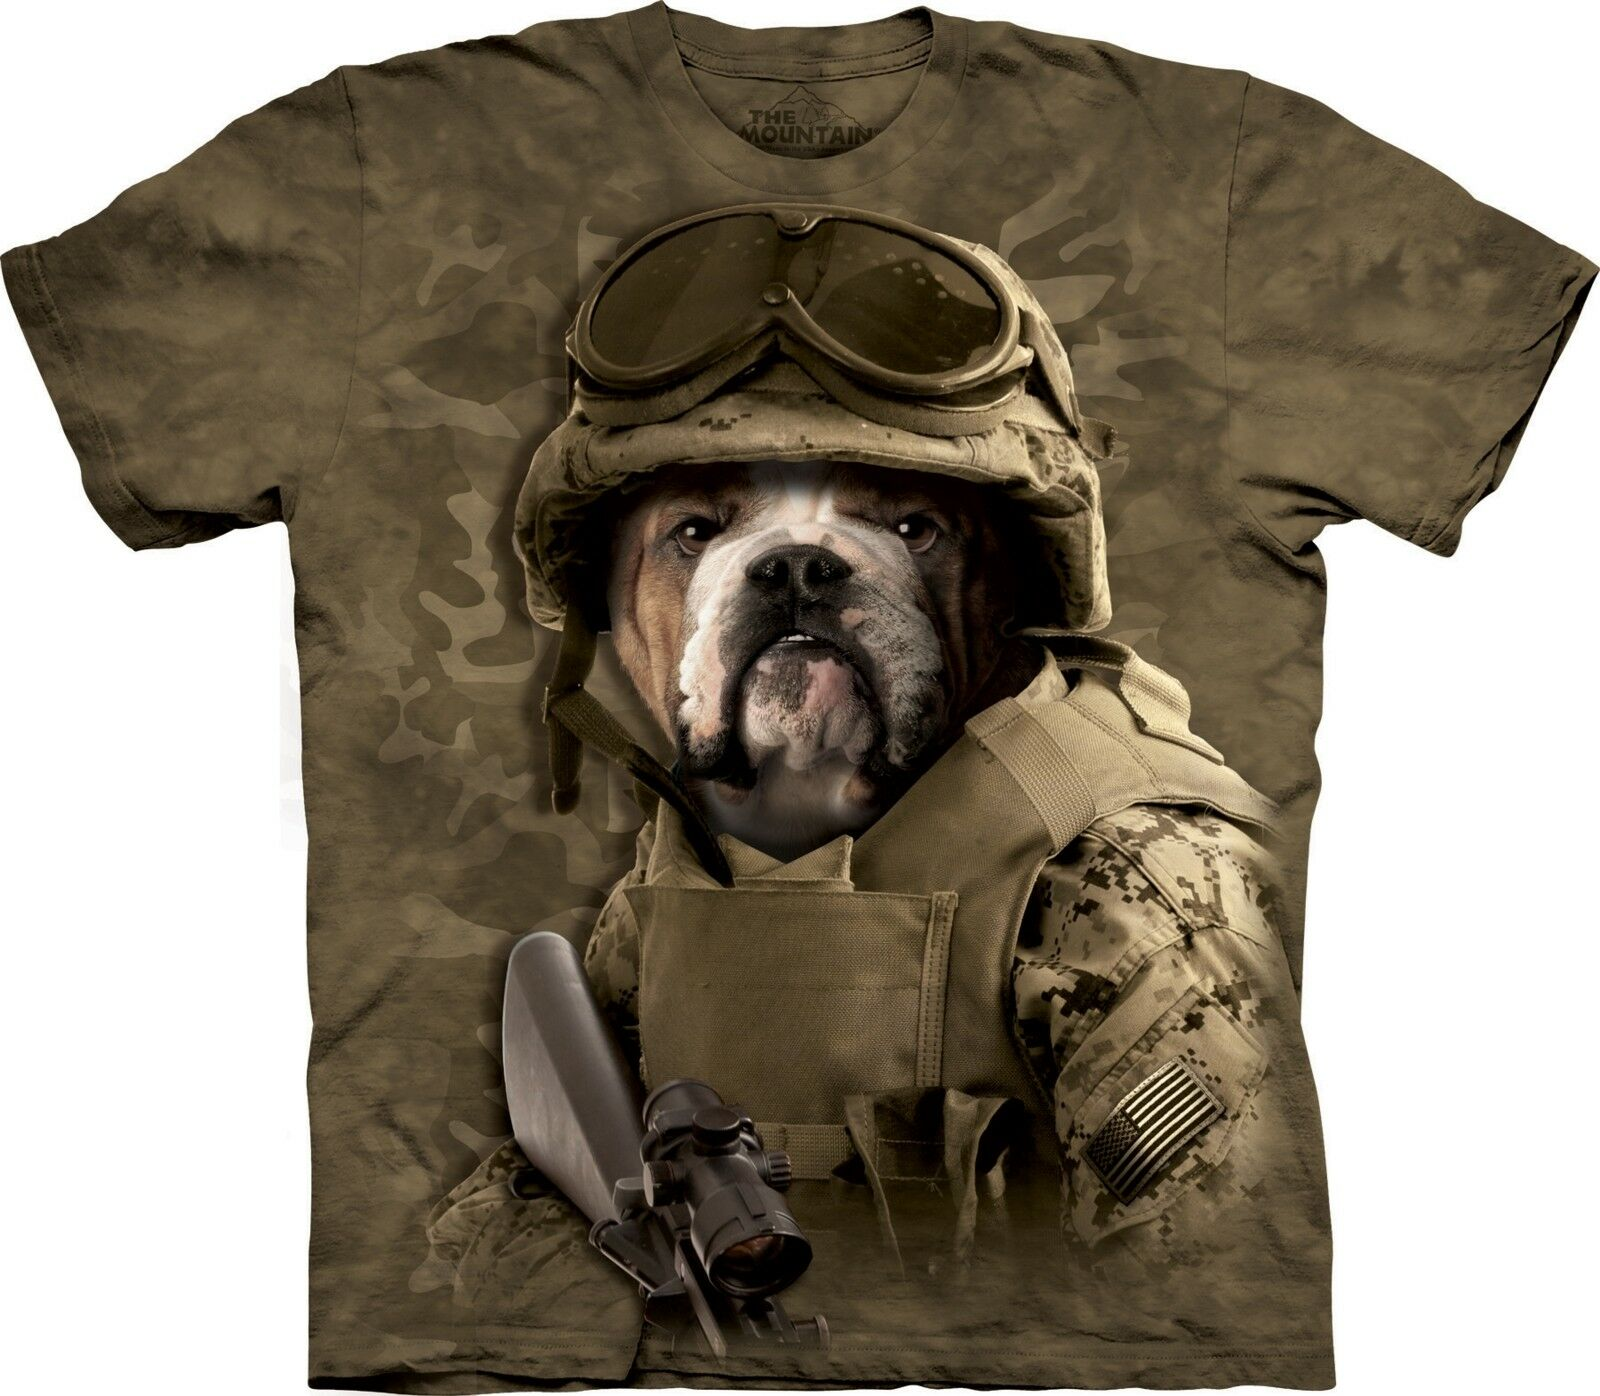 Combat Sam Manimals T Shirt Adult Unisex The Mountain